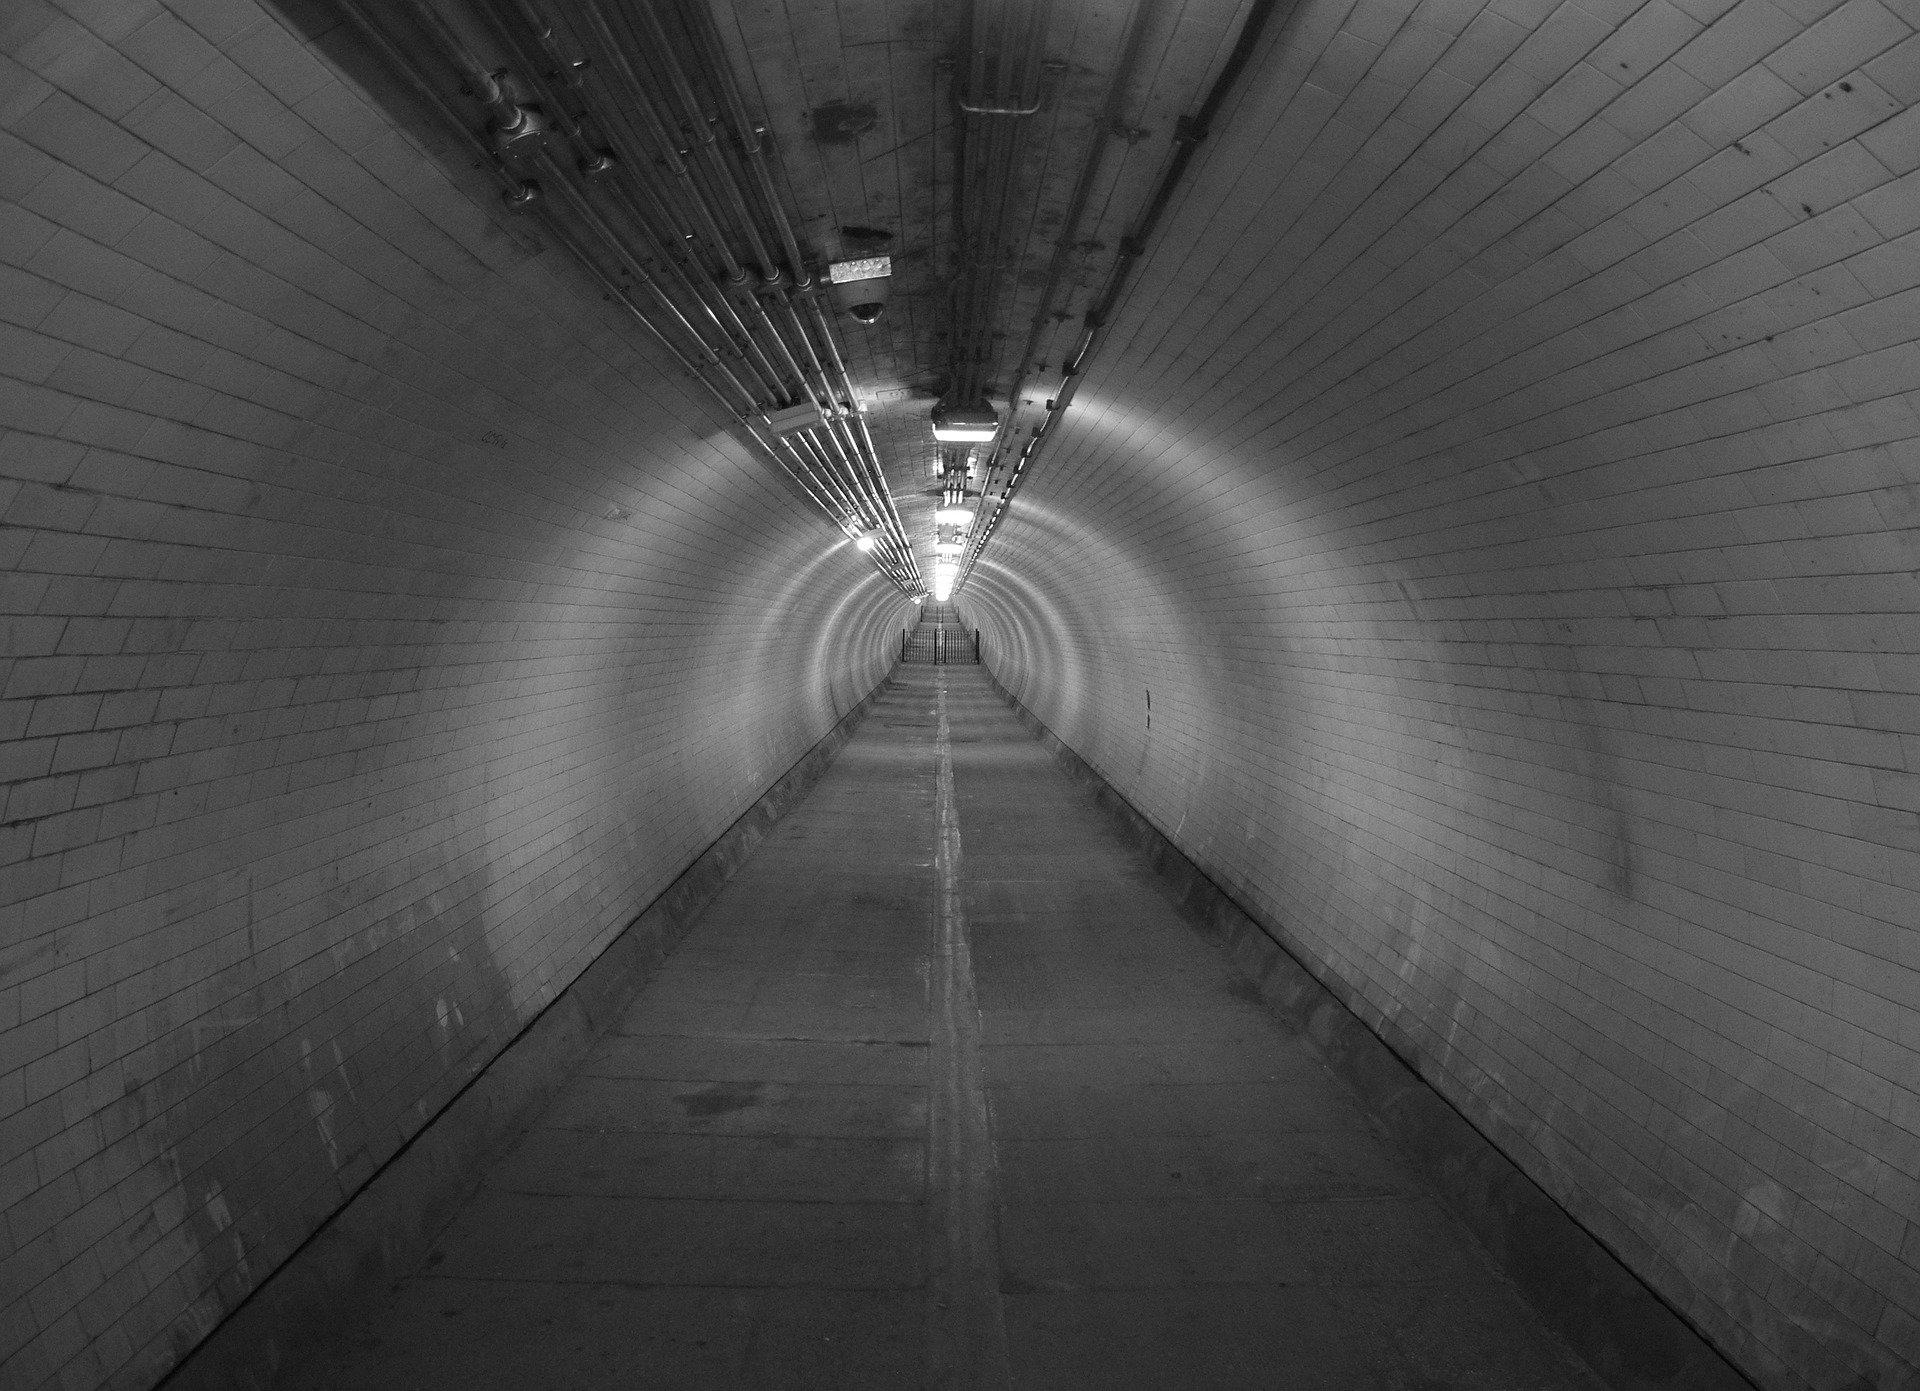 tunnel-746185_1920